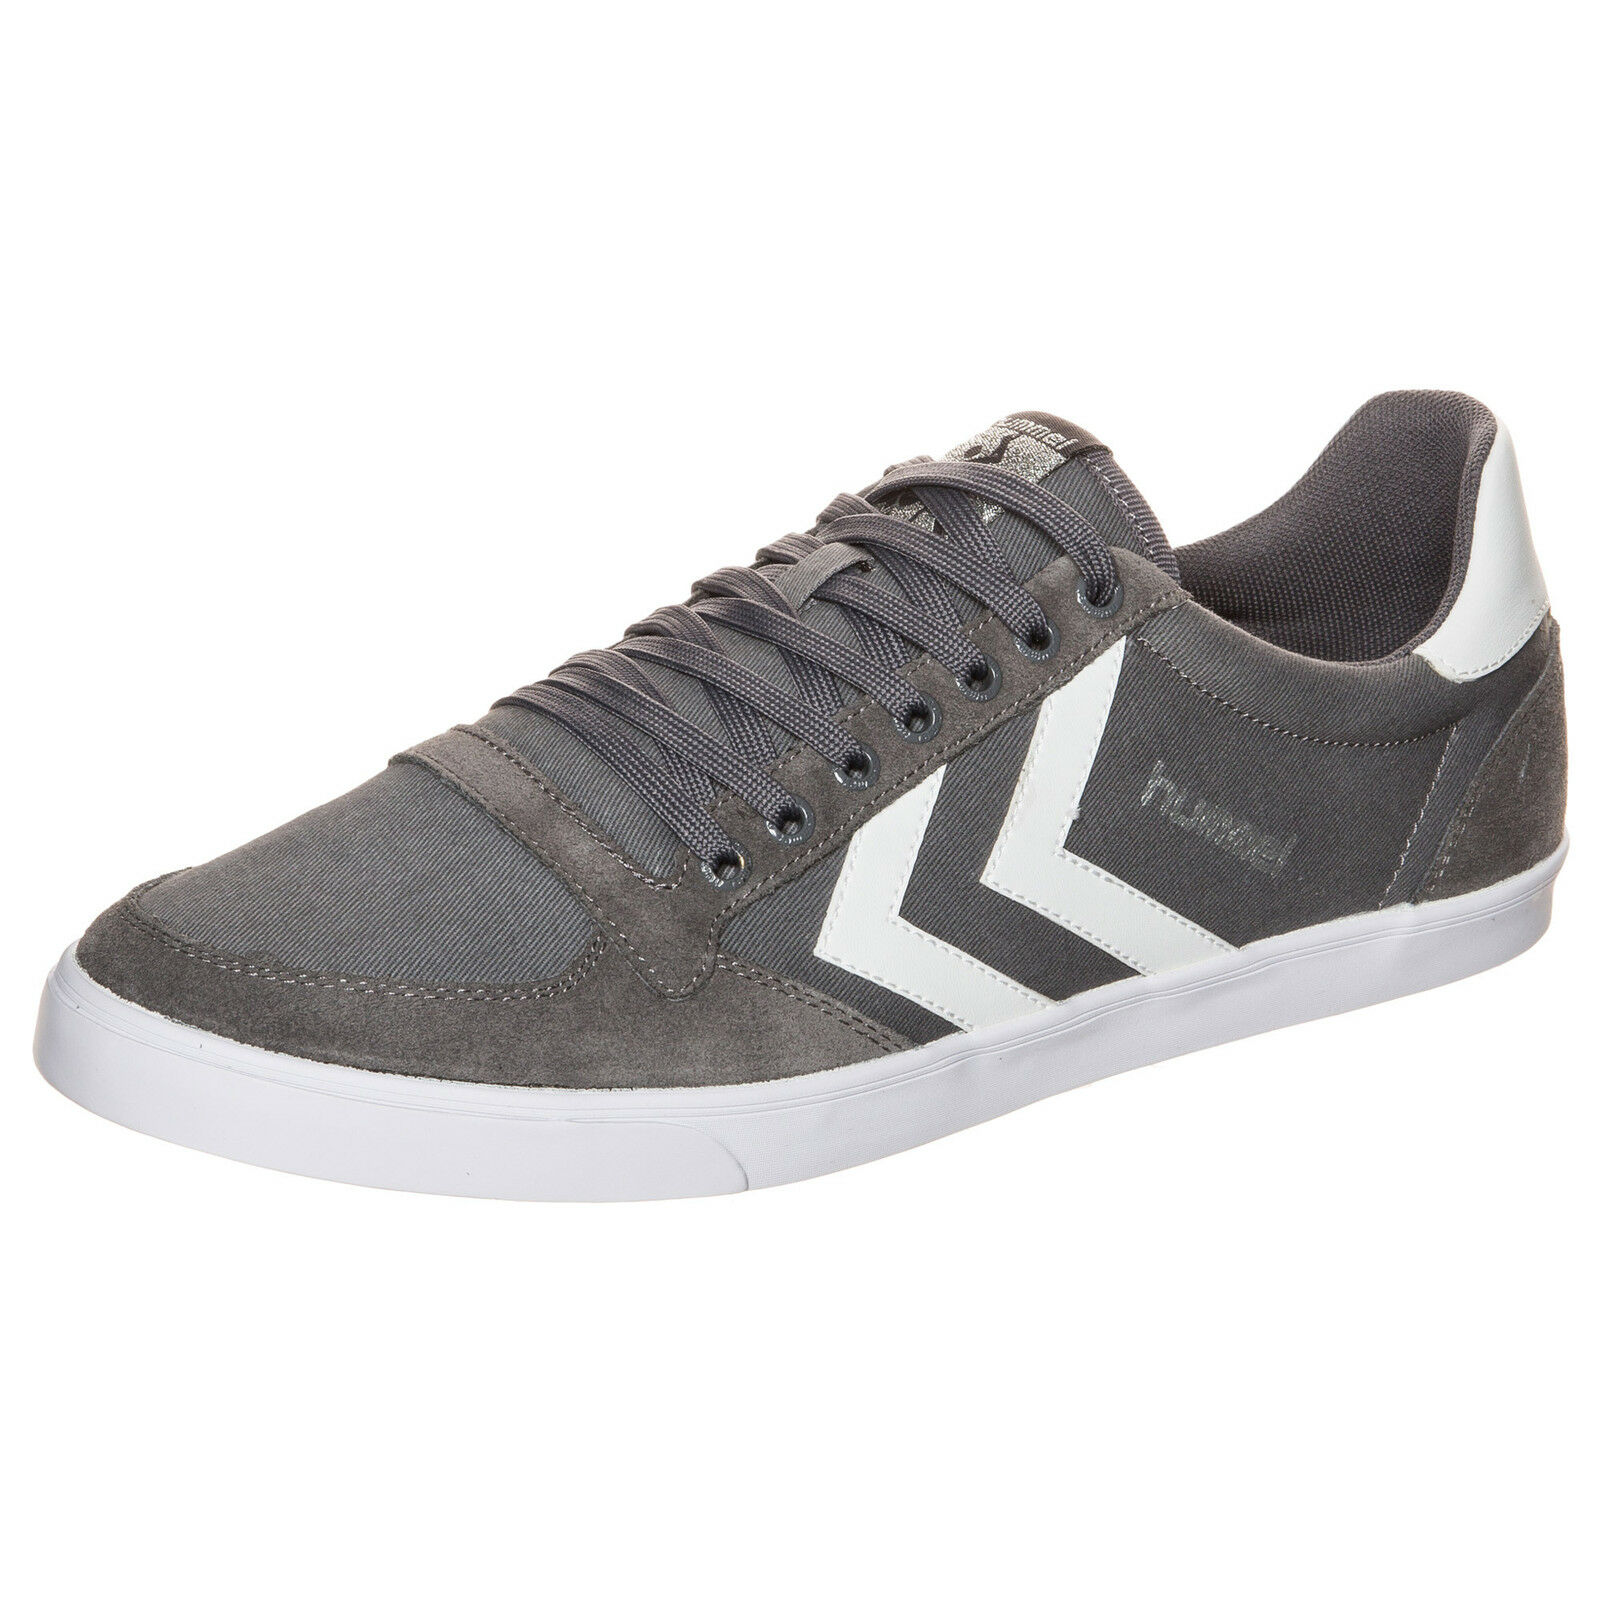 Hummel Slimmer Stadil Low Sneaker Grau NEU Schuhe Turnschuhe